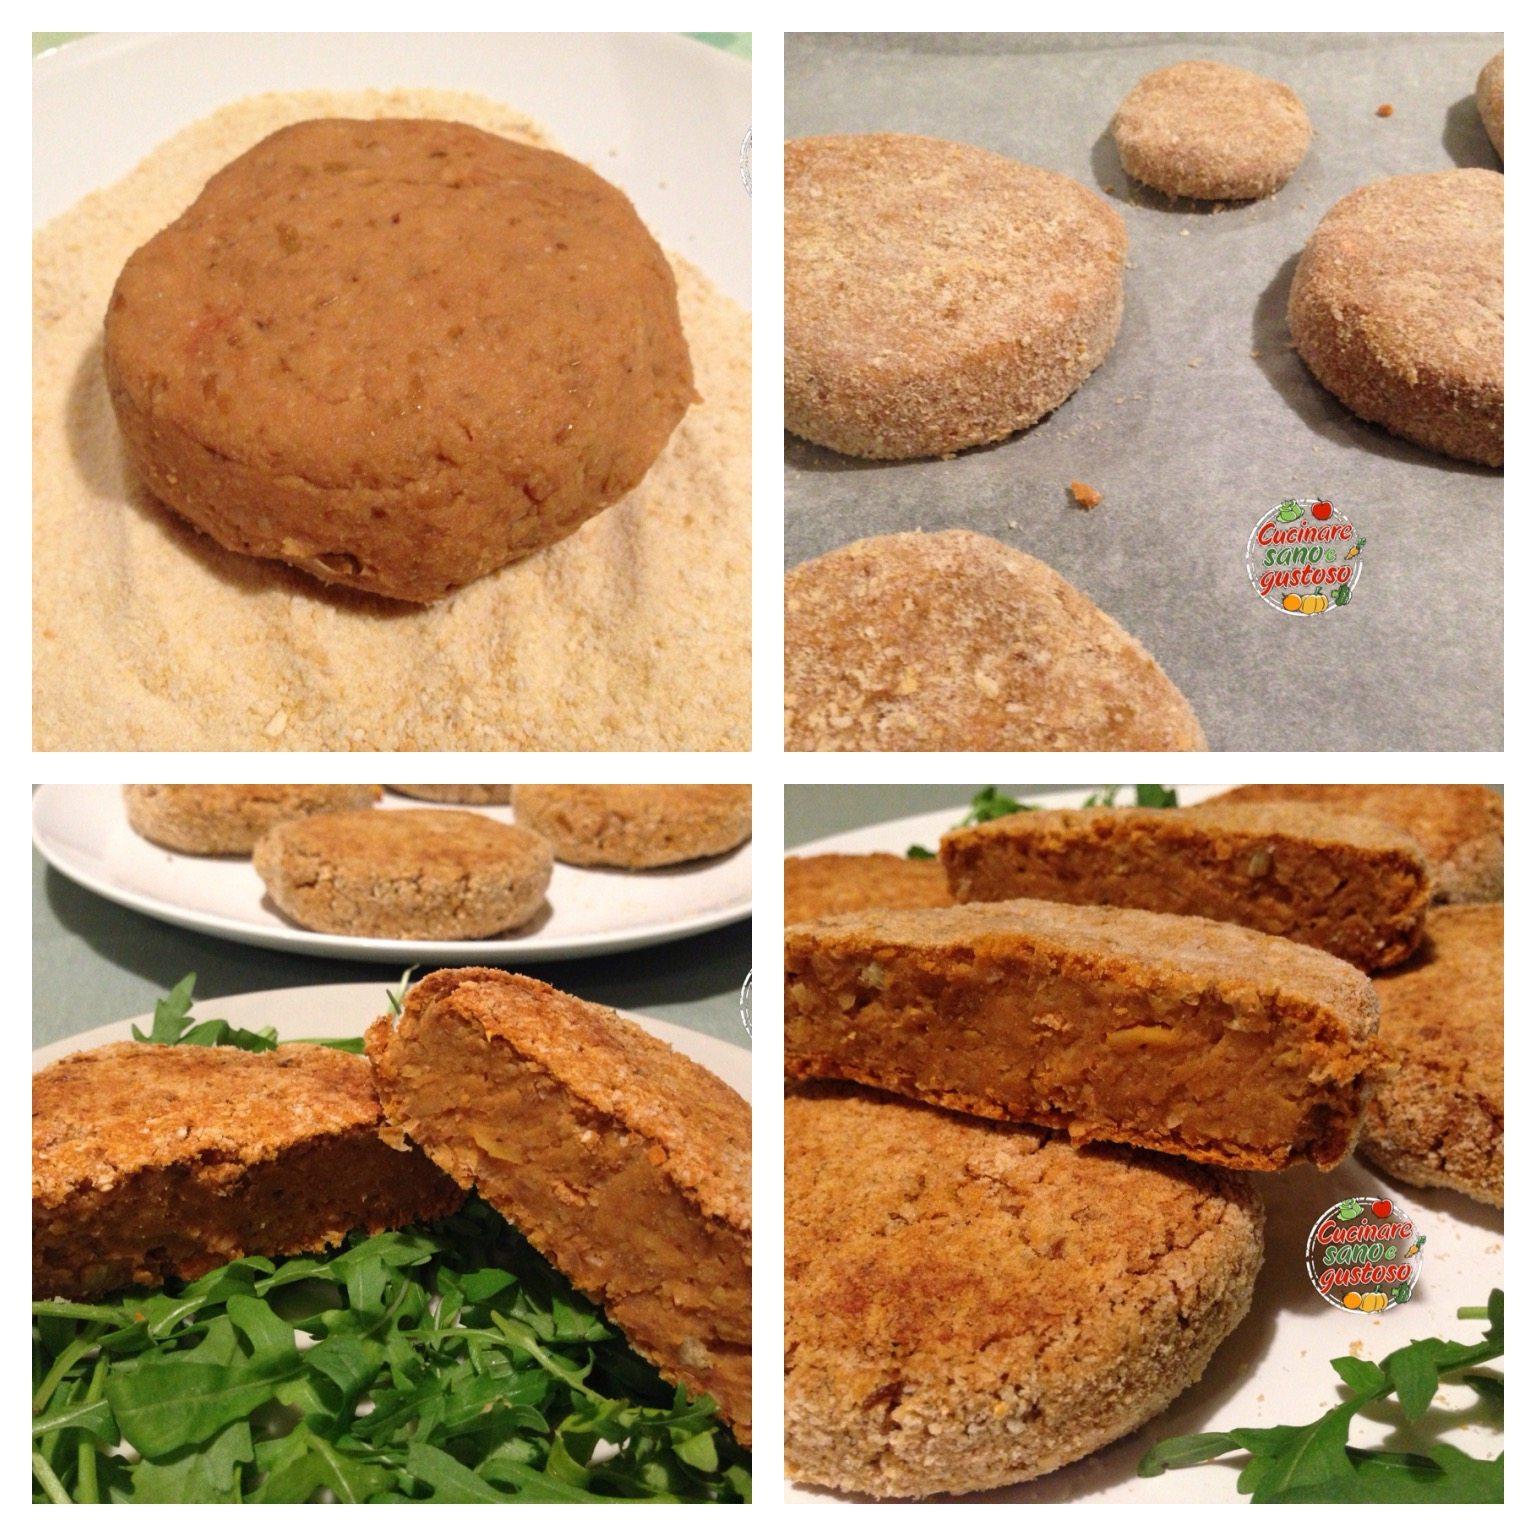 Burgher di legumi alla stroganoff cucinare sano e gustoso - Cucinare sano e gustoso ...